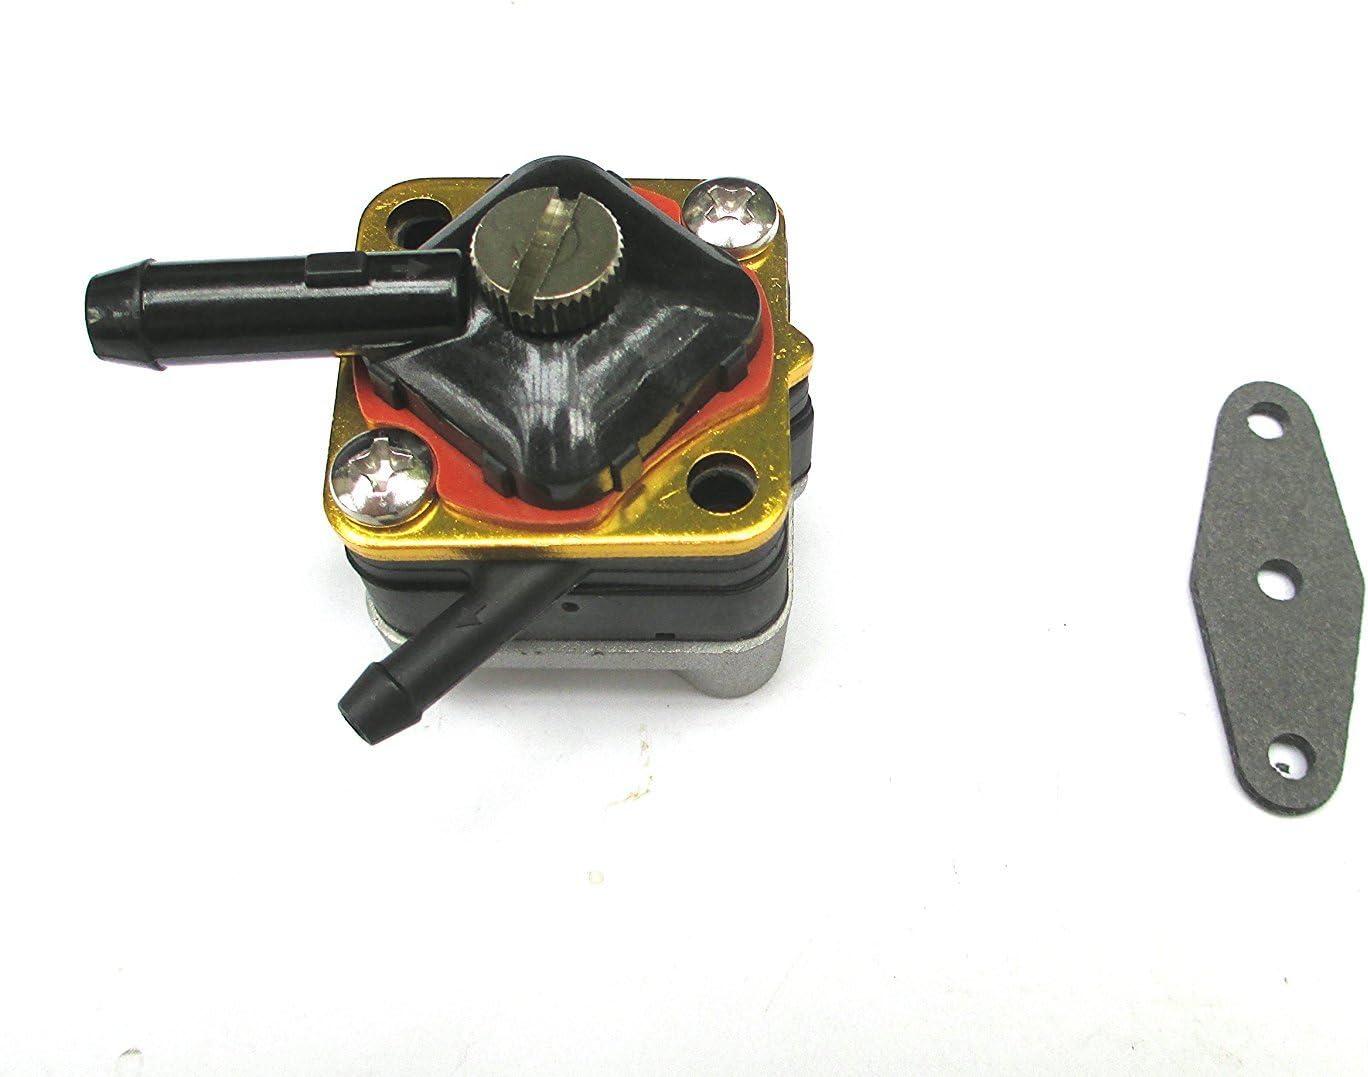 Fuel Pump for Johnson//Evinrude OMC SIE  9.9hp 15hp Pre 1993 397839 motor 18-7350